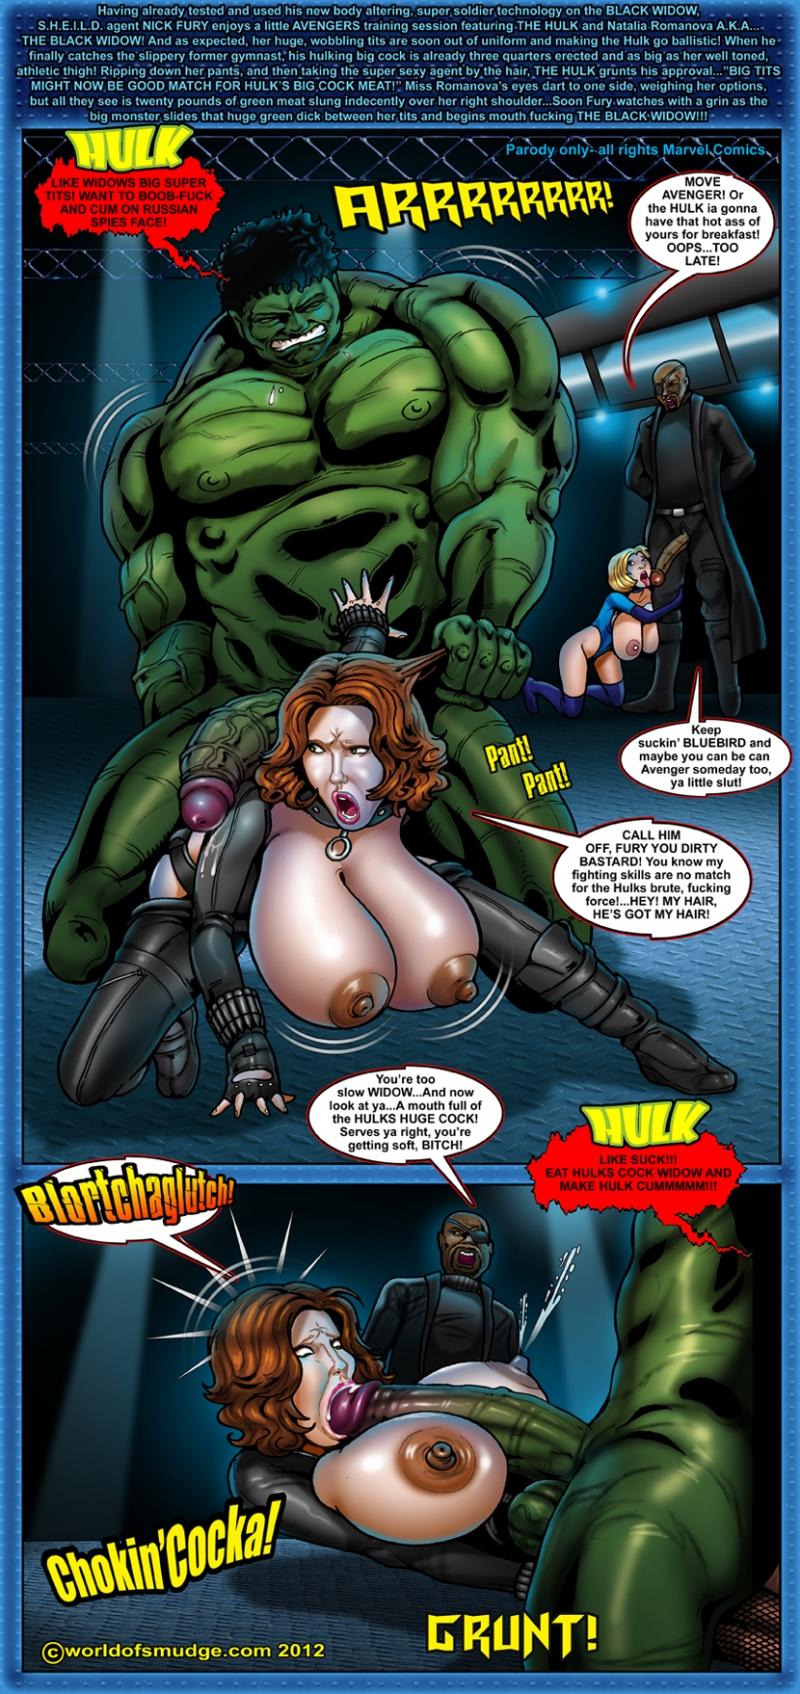 Hulk 967428 - Avengers Black_Widow BlueBird Hulk Marvel Nick_Fury Smudge.jpg